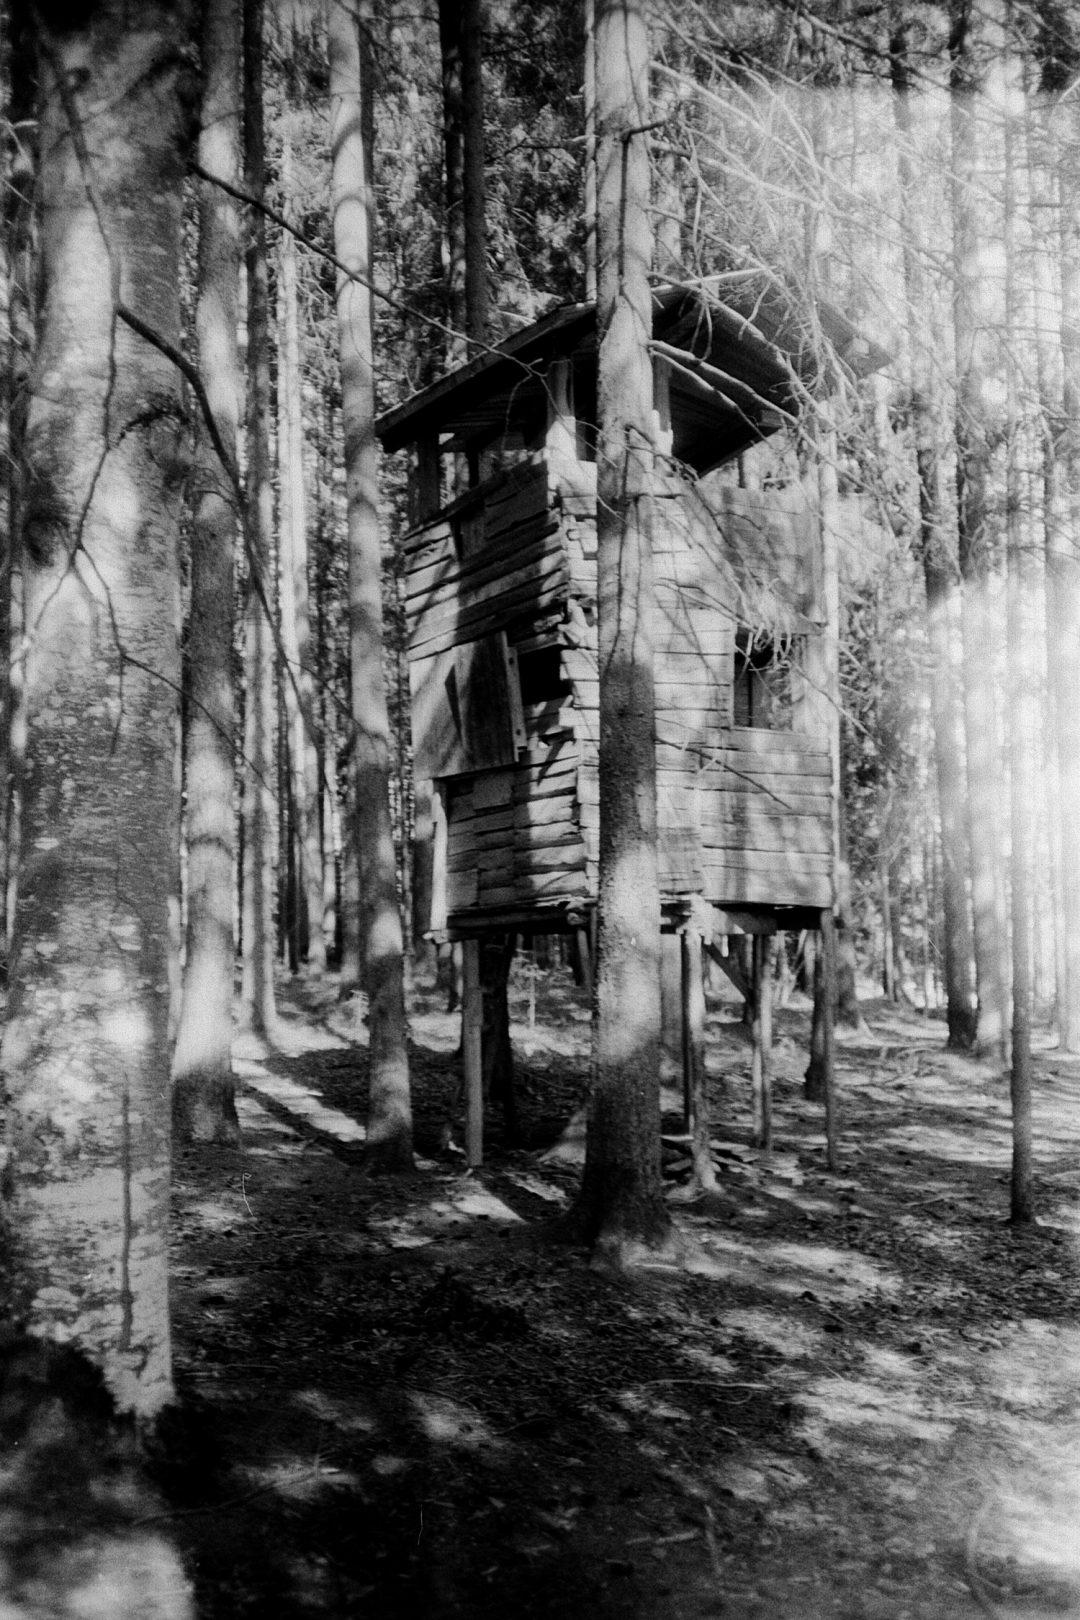 #127 Tree house, Birnberg